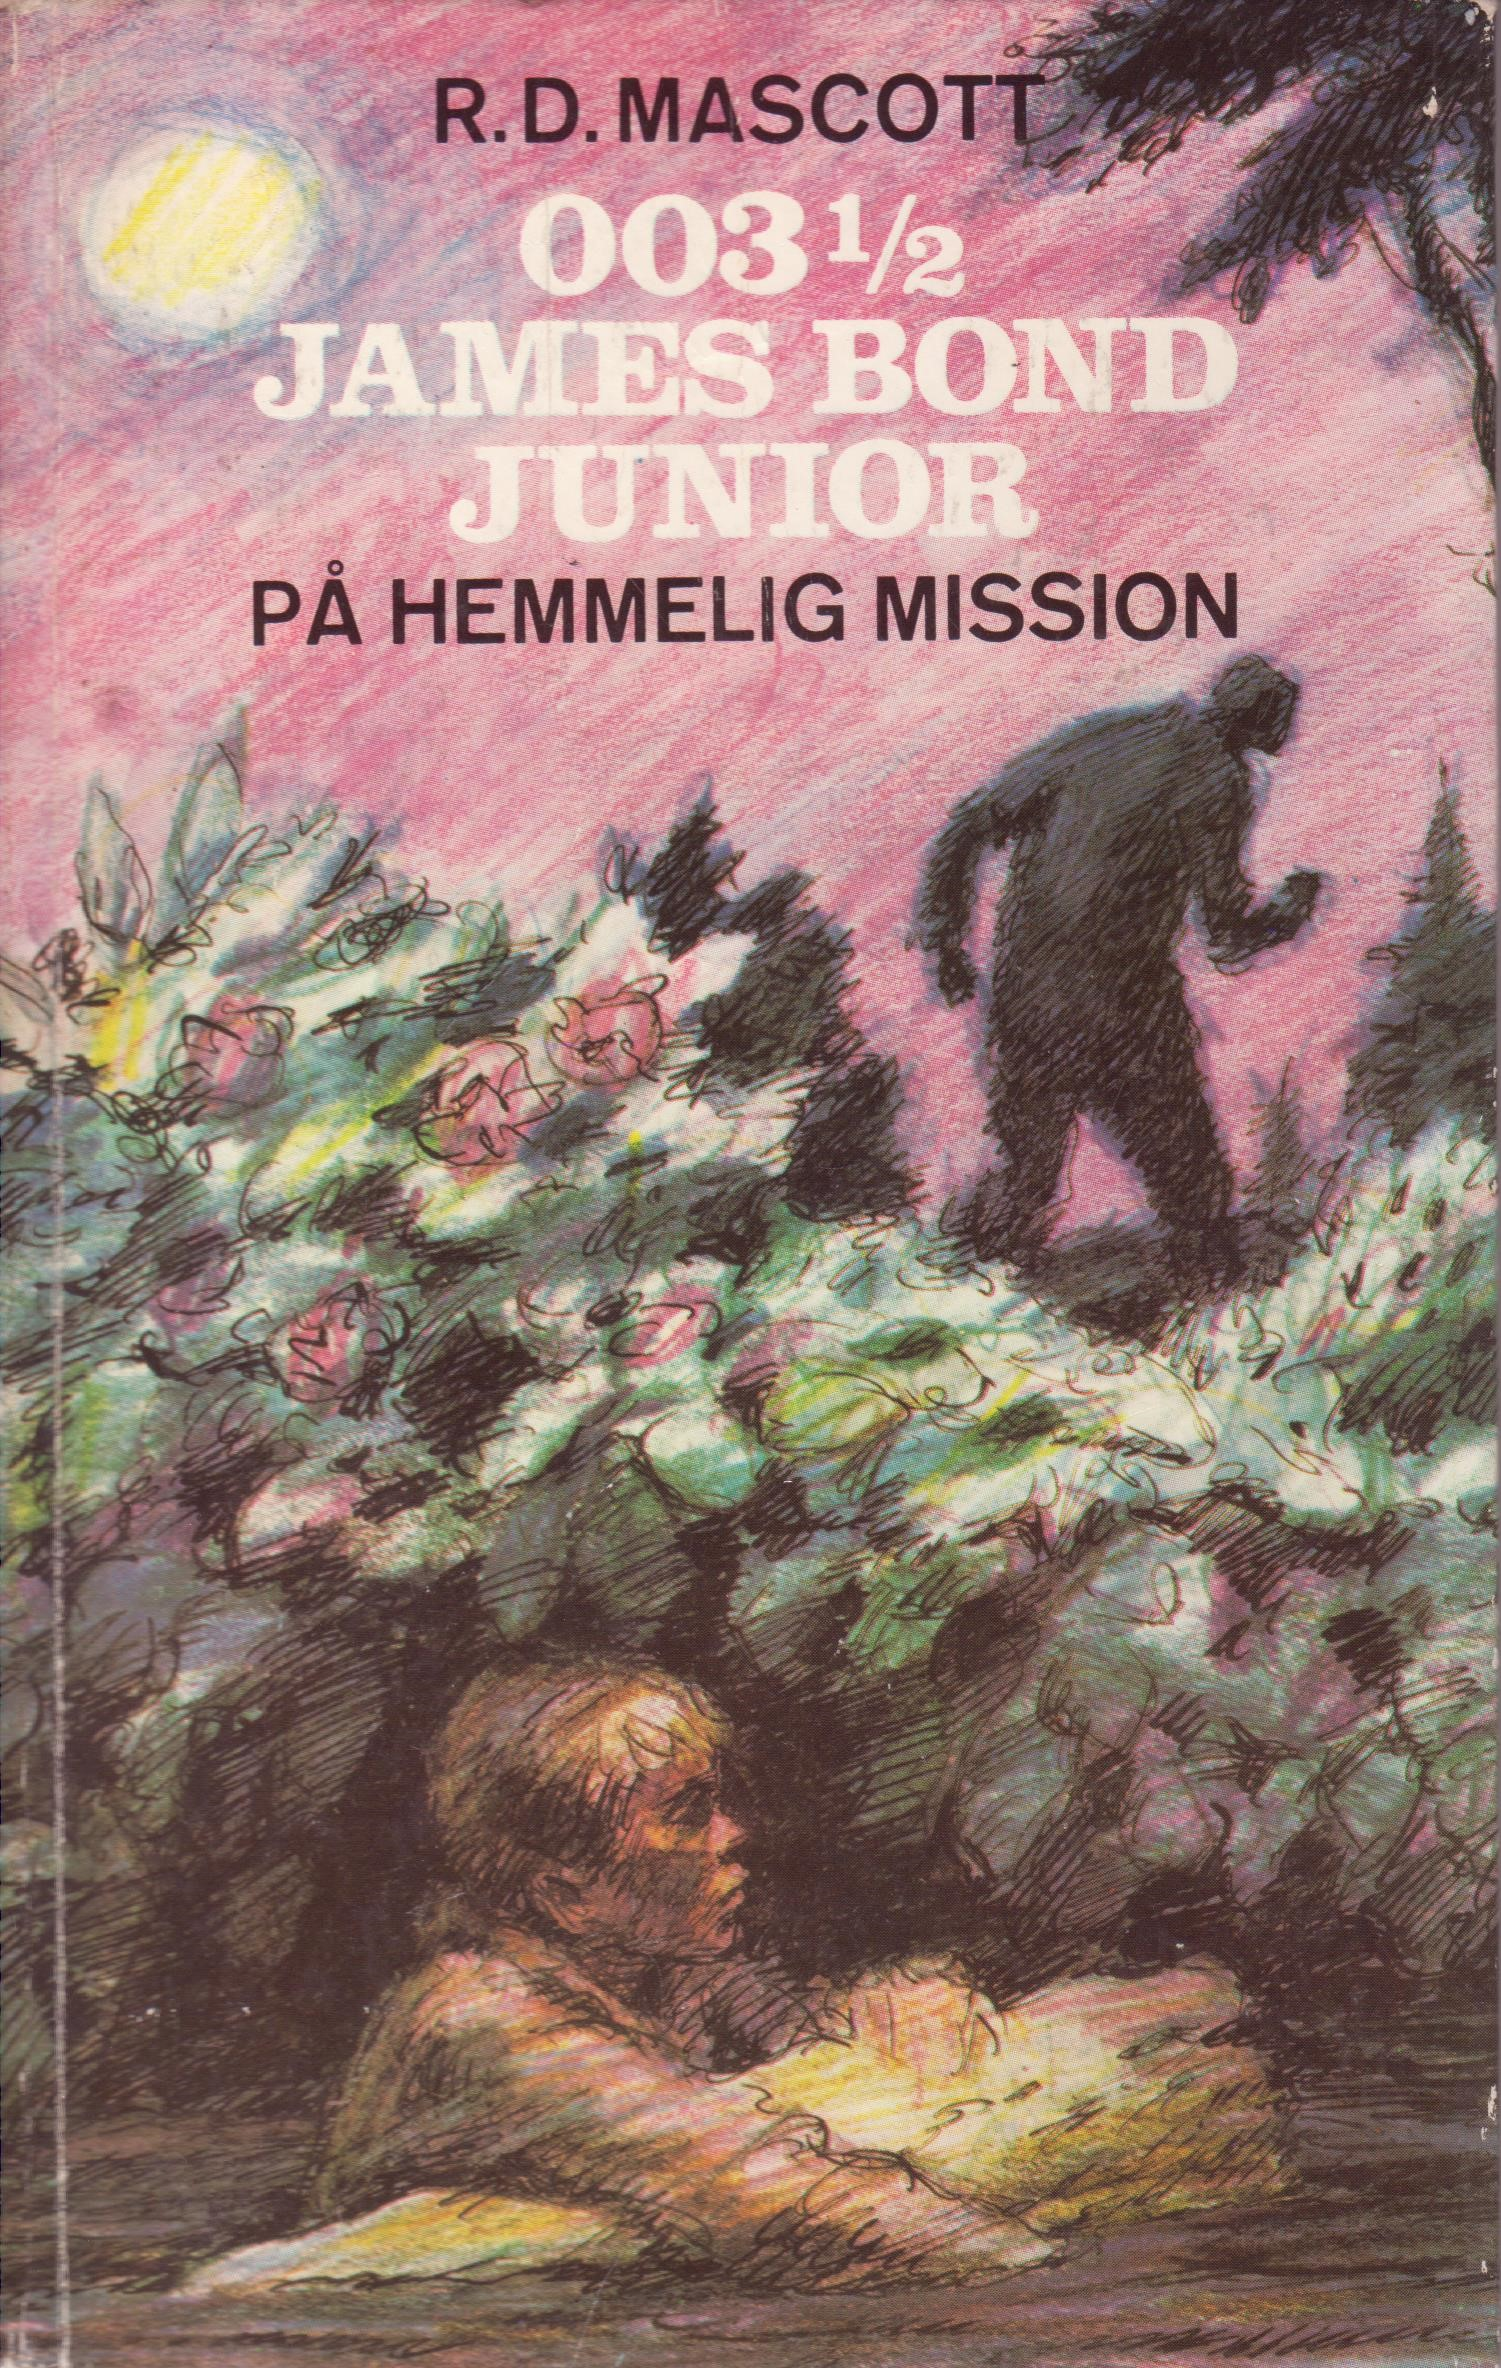 003½ paa hemmelig mission - DK forside 1970